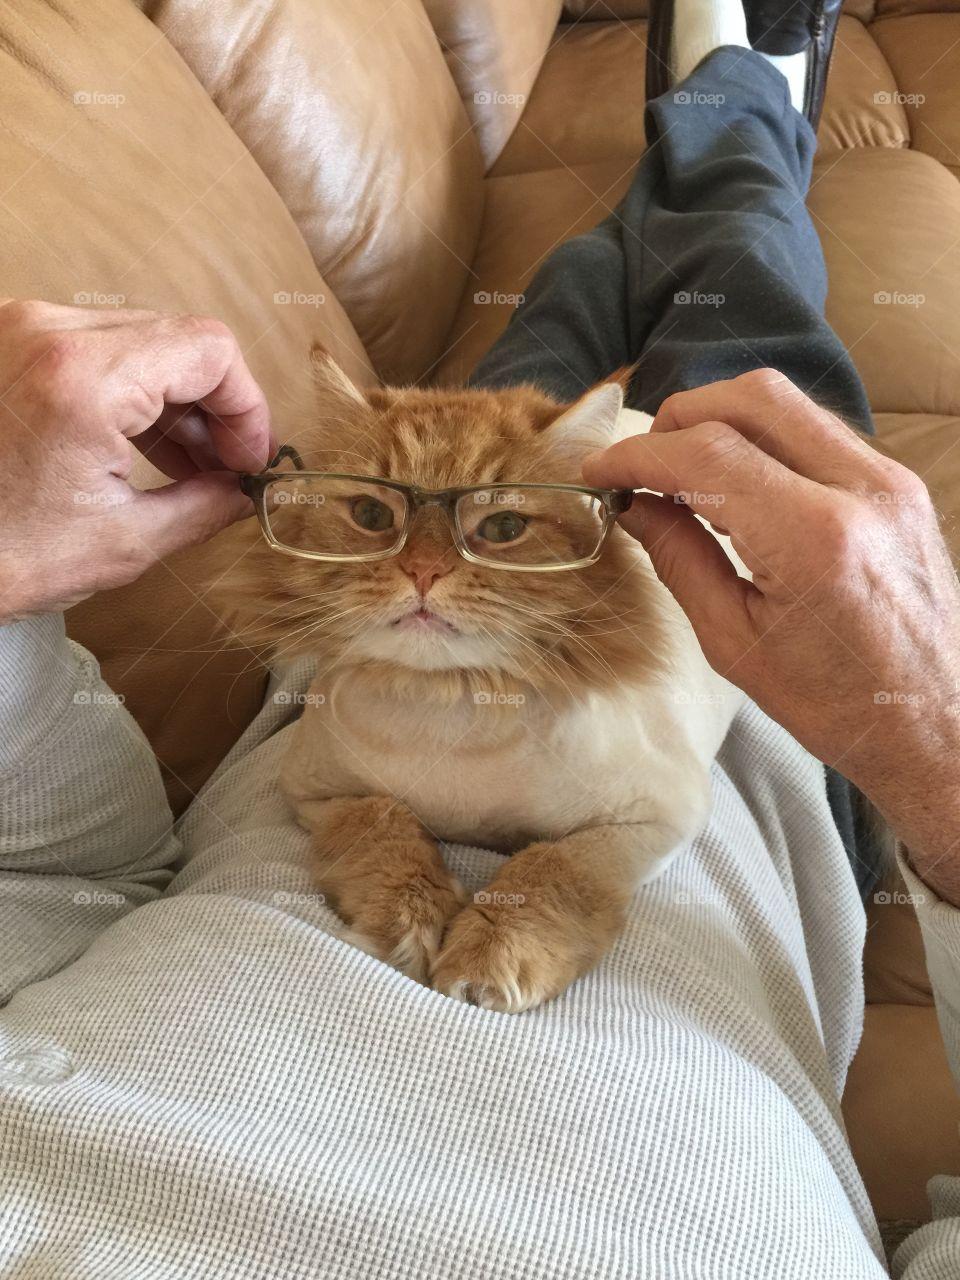 Cat sitting on man's body